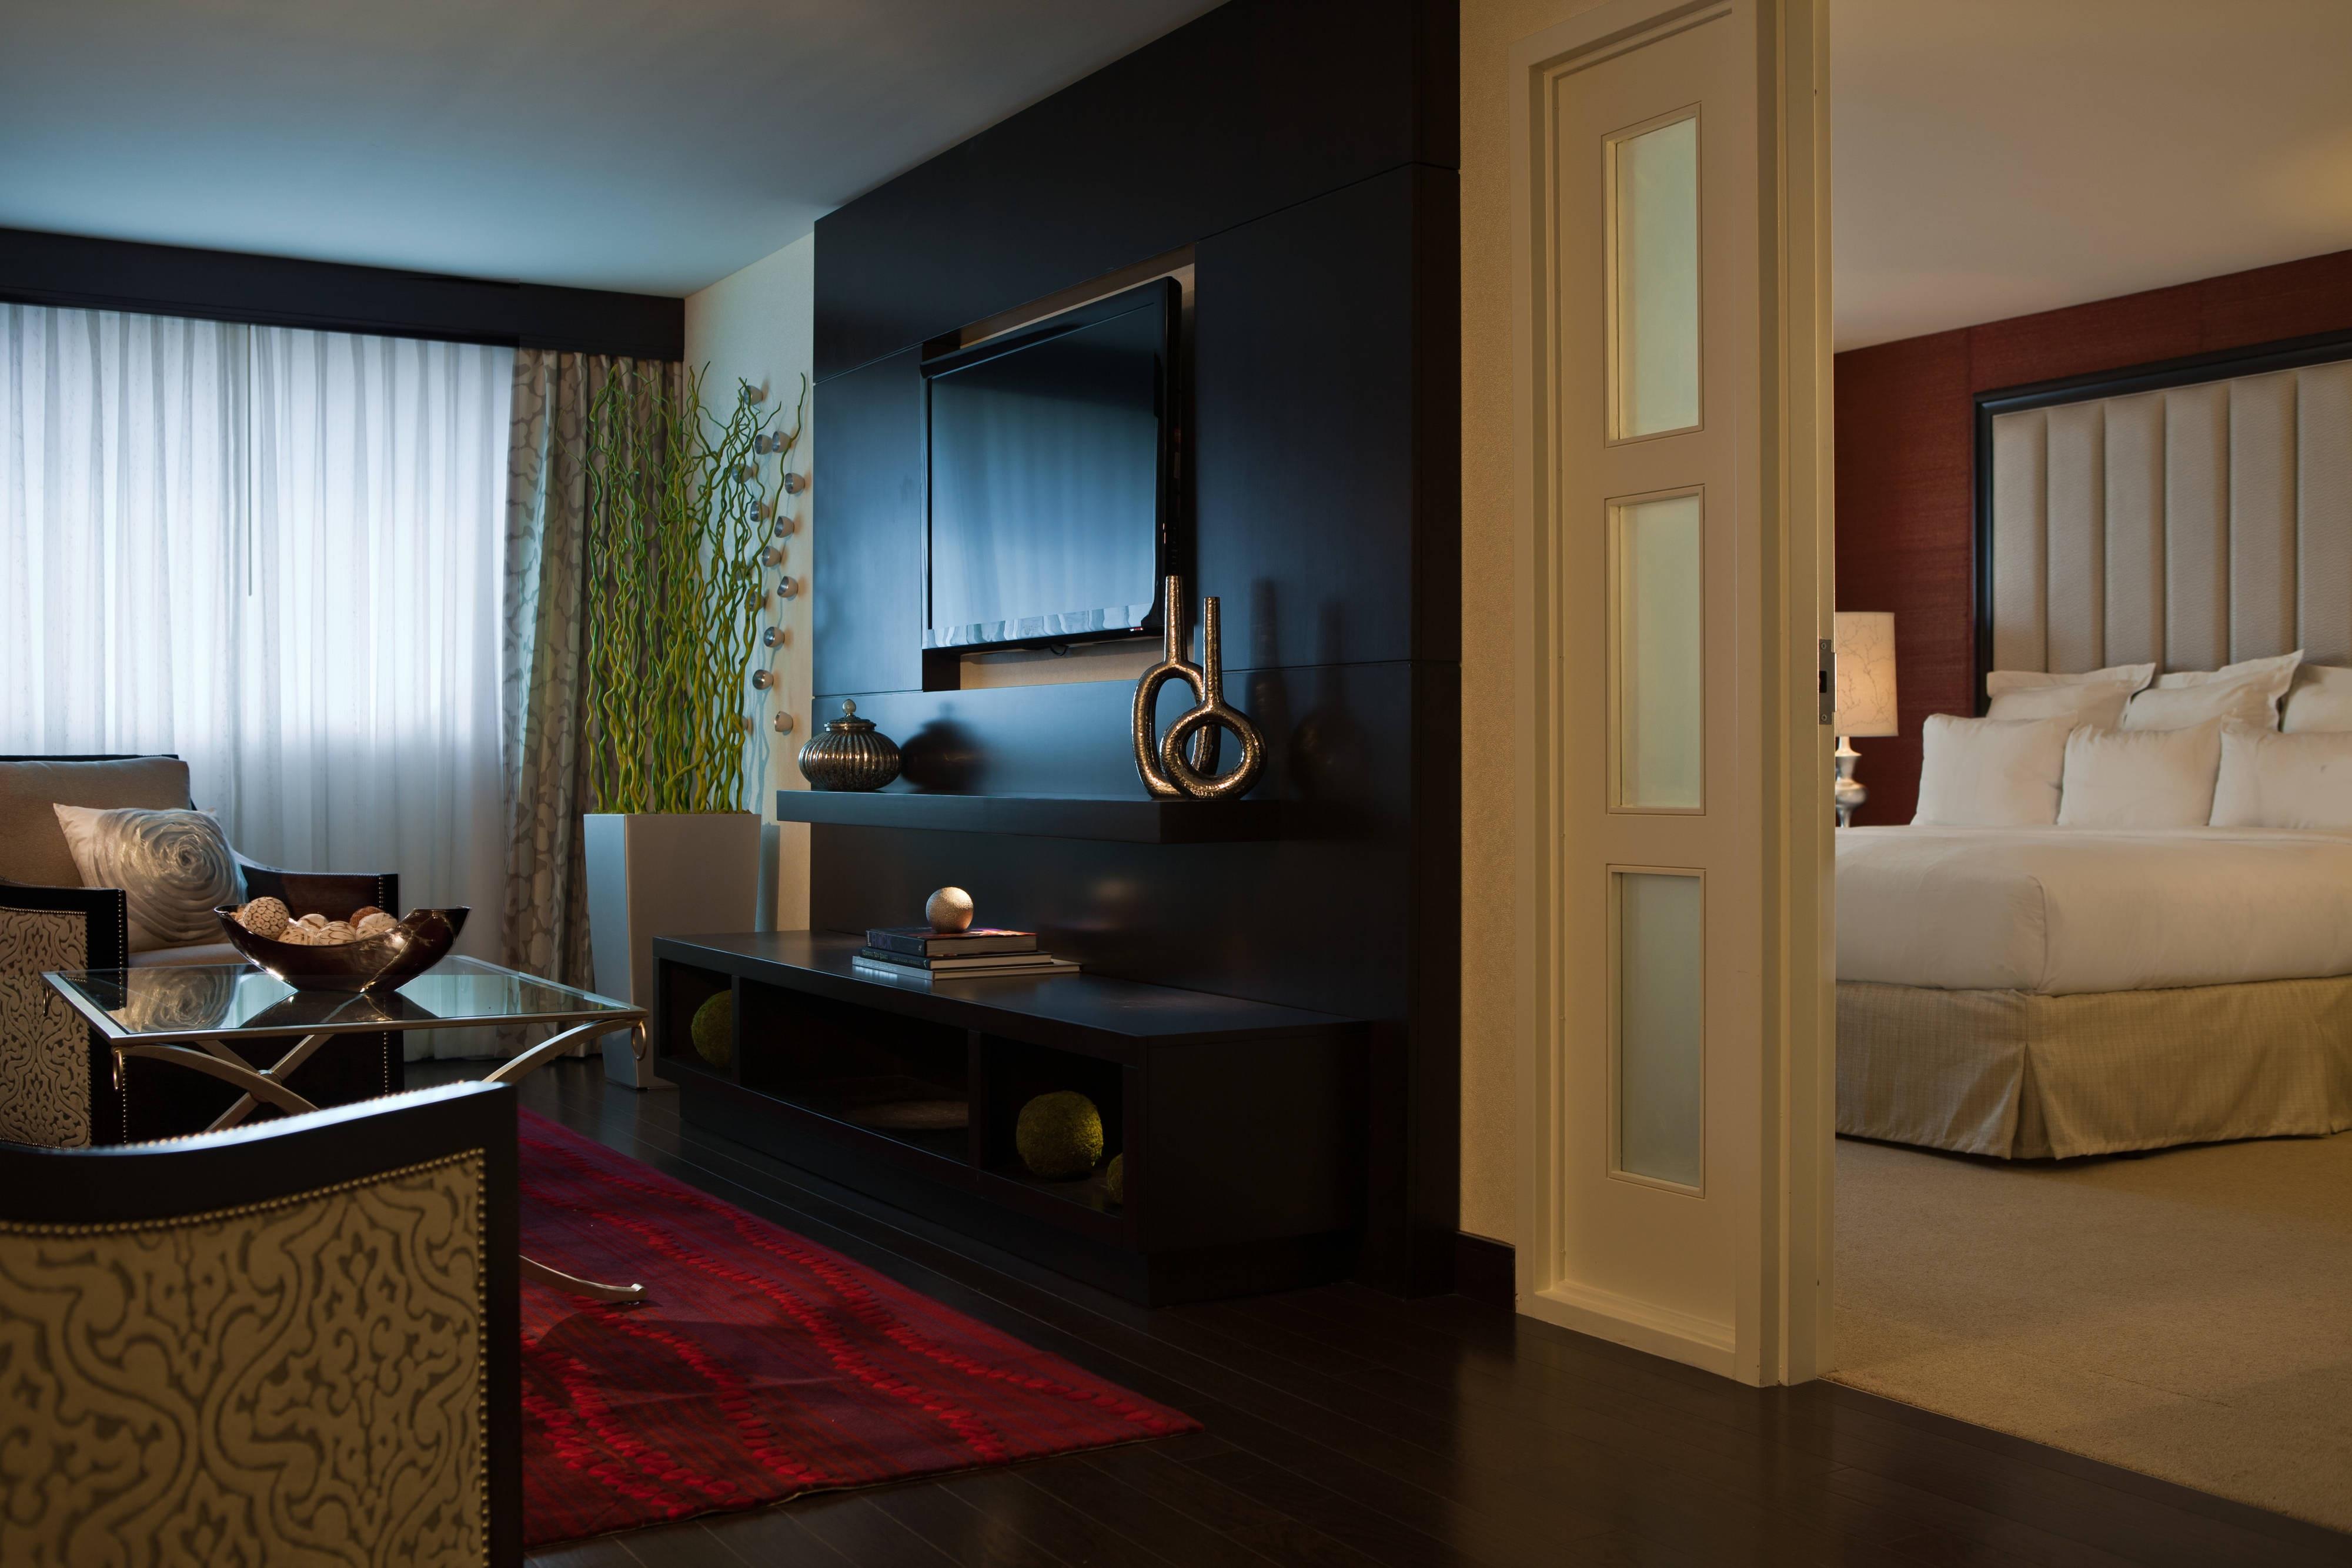 Newark airport hotel suite